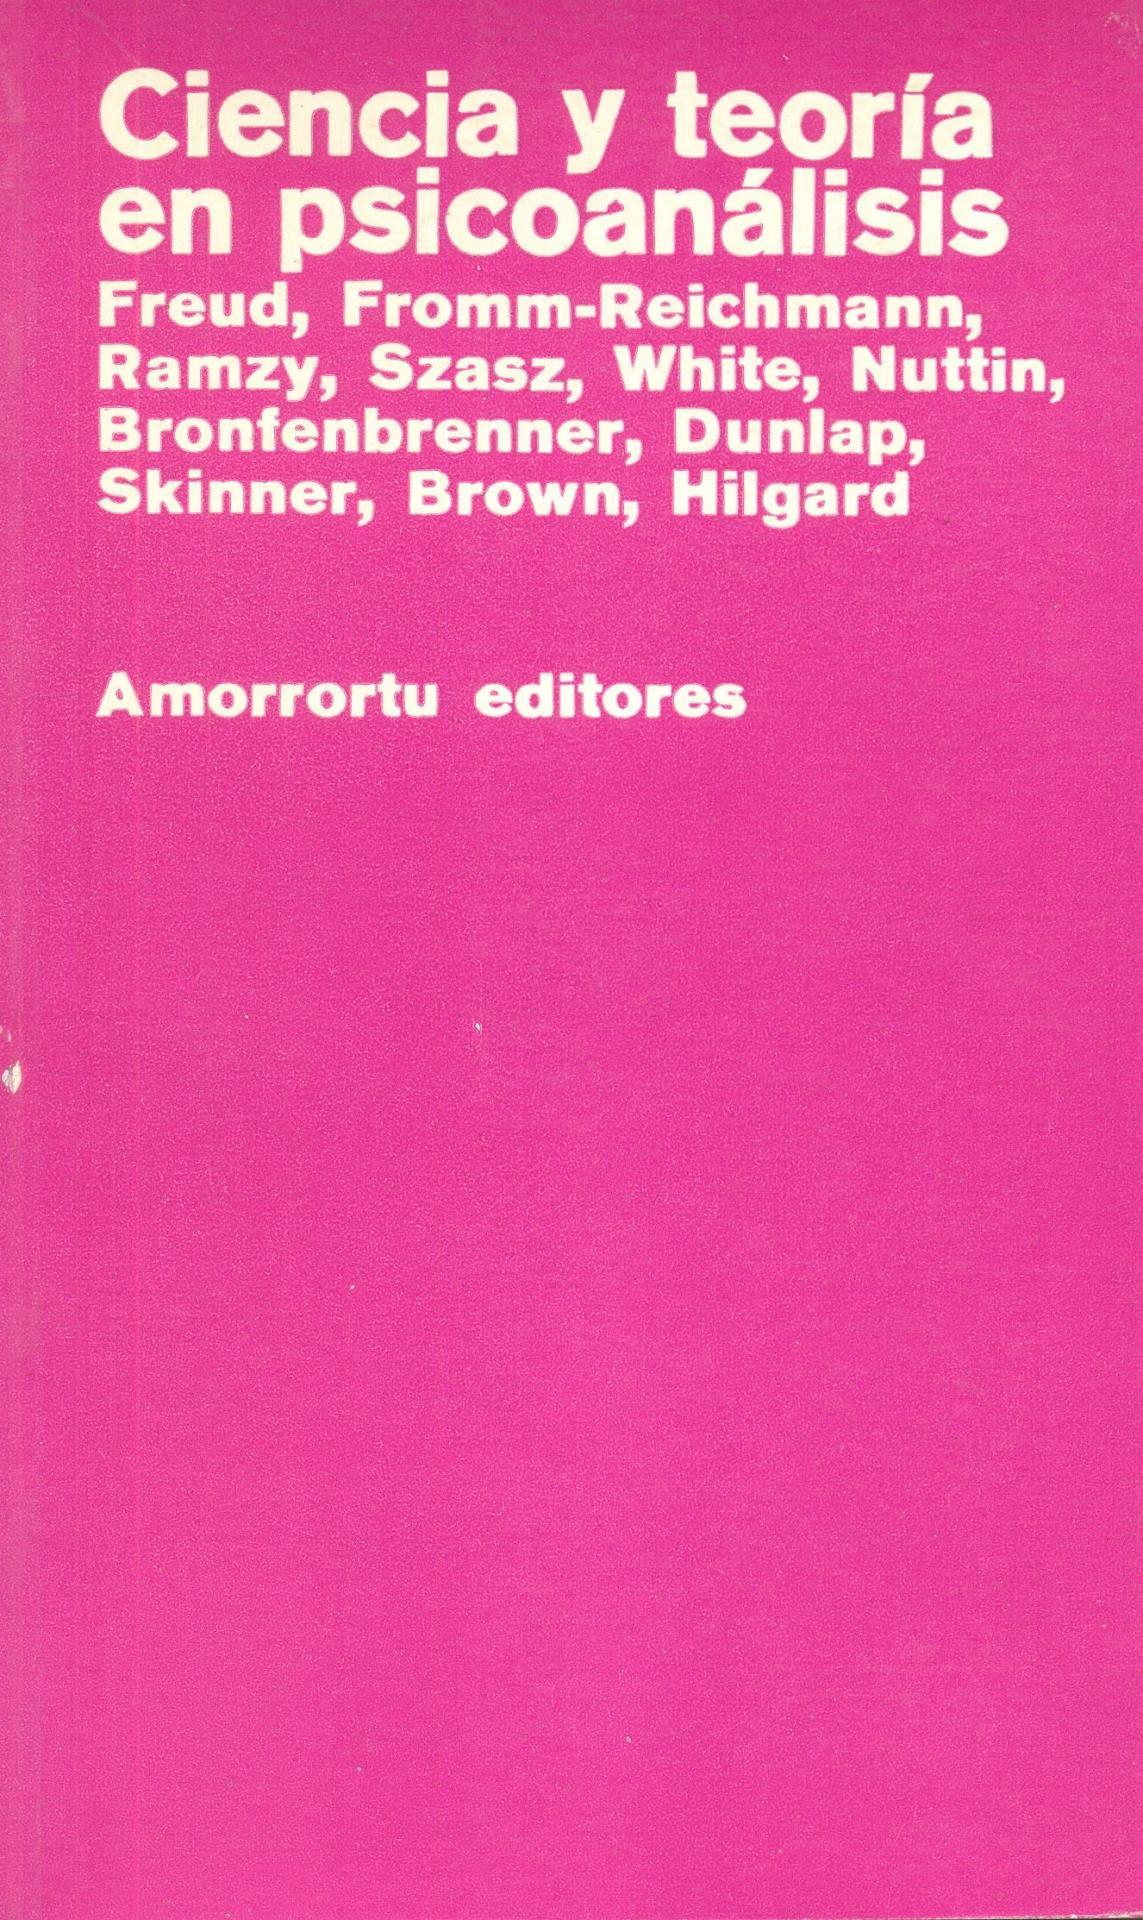 CIENCIA Y TEORÍA EN PSICOANÁLISIS. Freud,  Fromm-Reichmann, Ramzy, Szasz, White, Nutin,  Bronfenbrenner, Dunlap, Skinner, Brown, Hilgard.